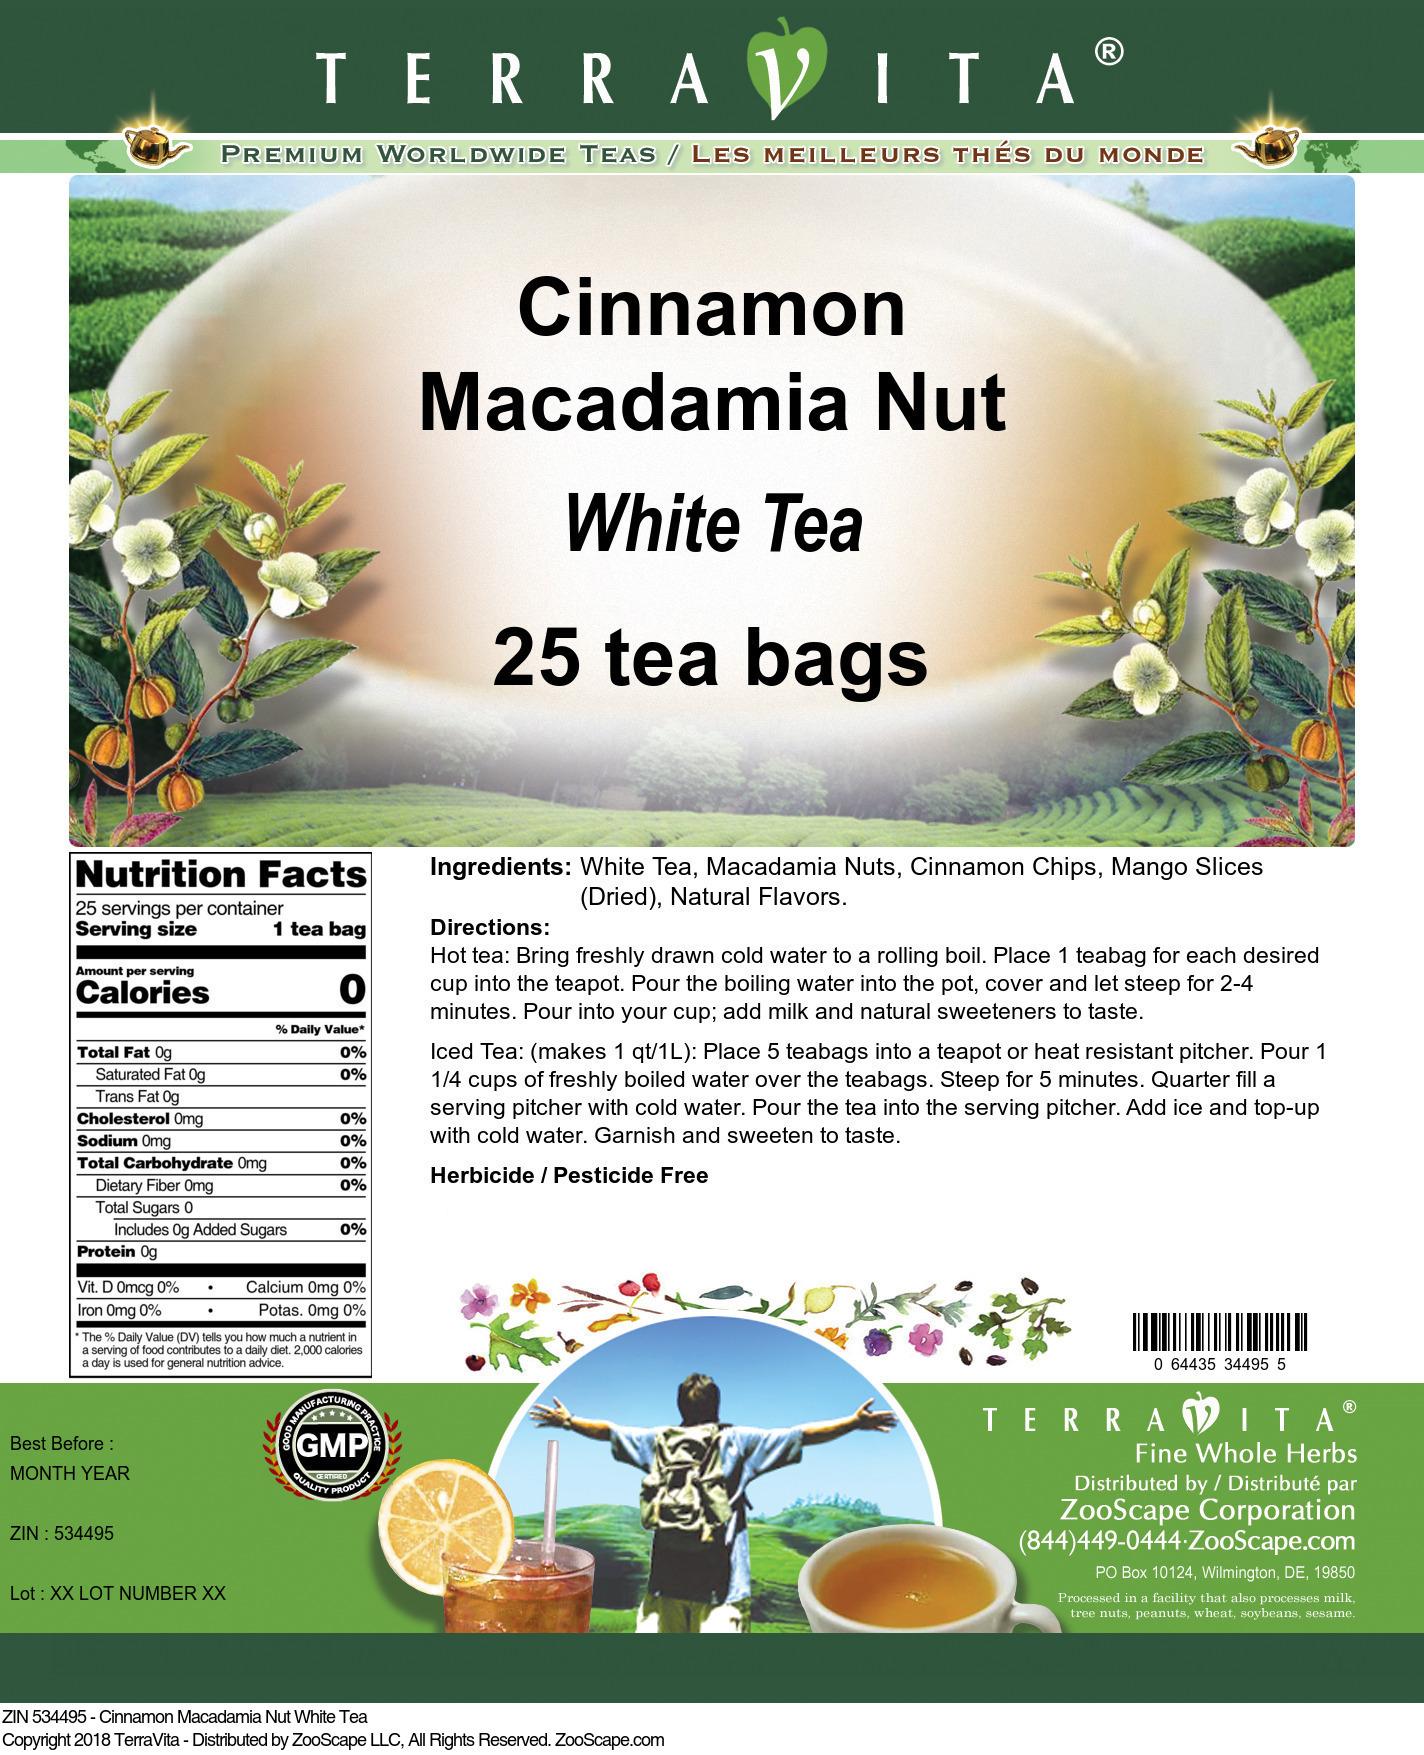 Cinnamon Macadamia Nut White Tea